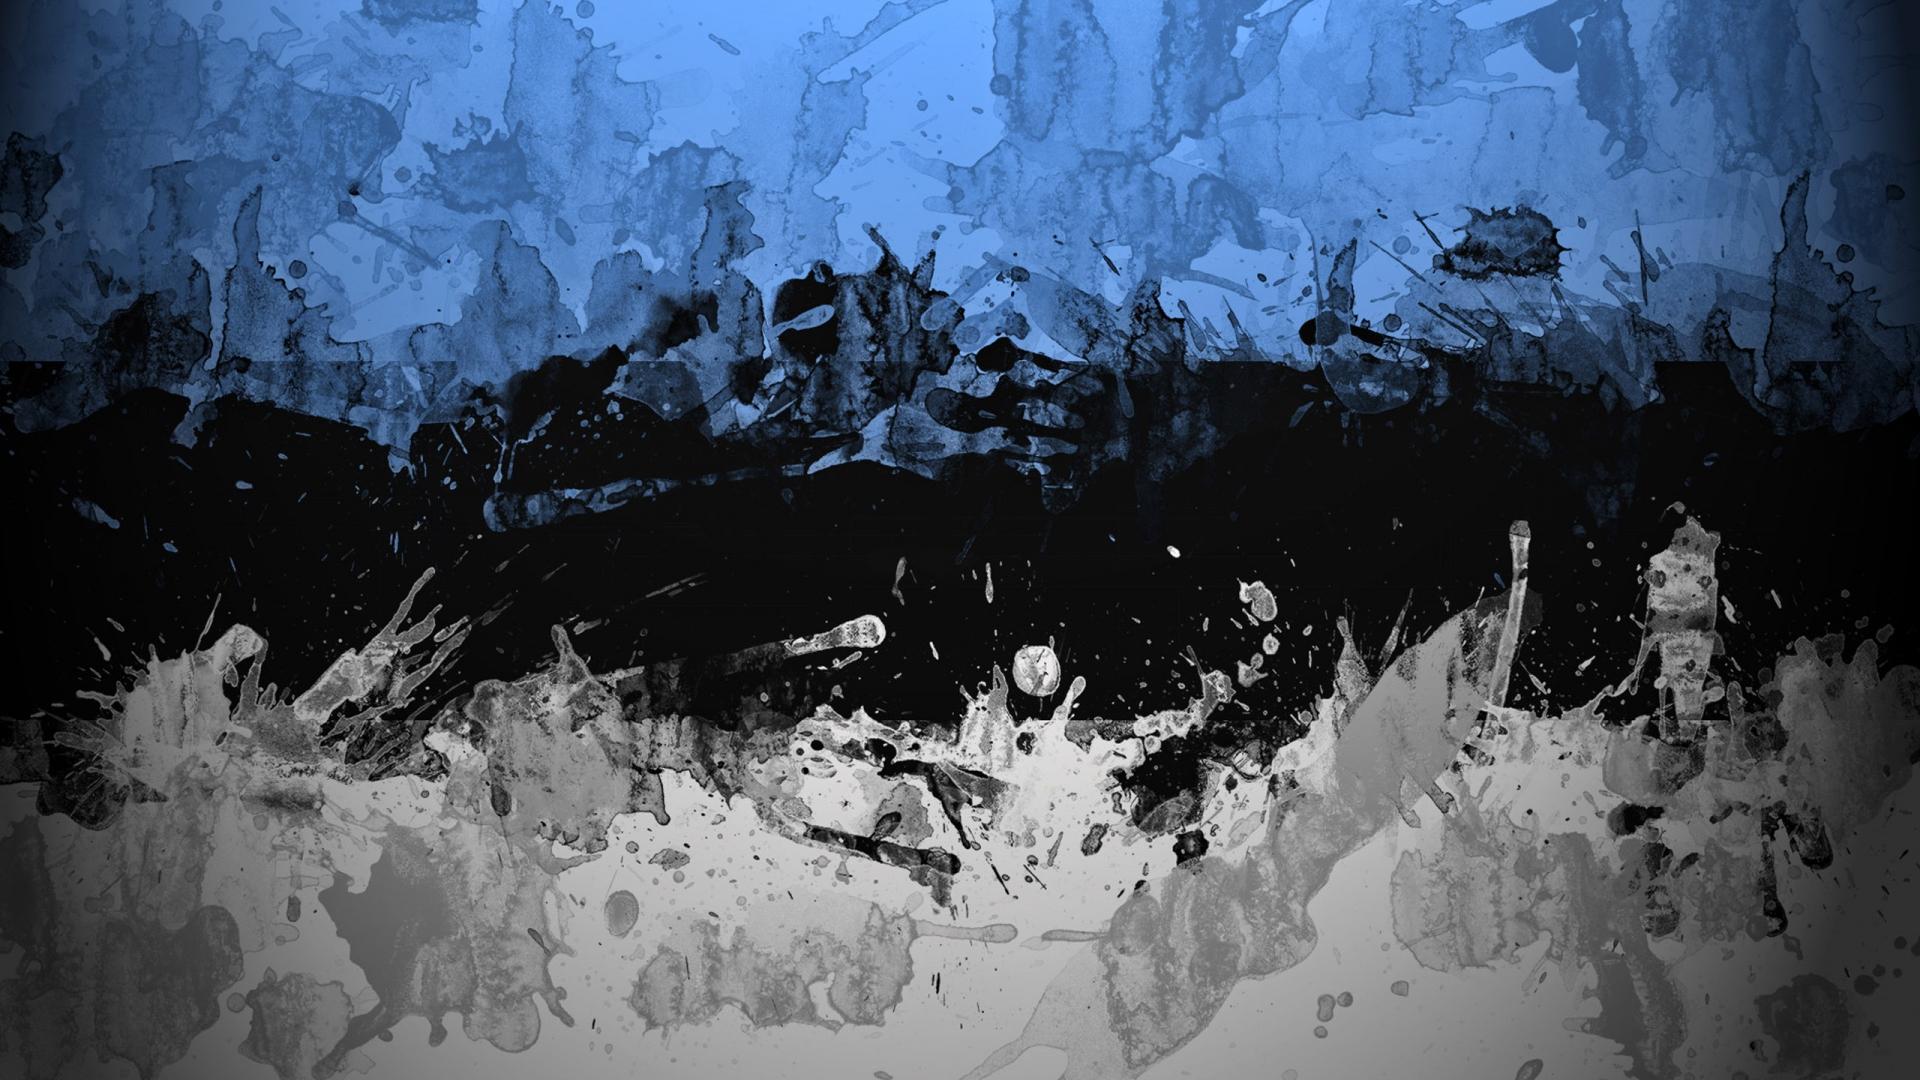 Abstract Wallpaper 1080p - WallpaperSafari